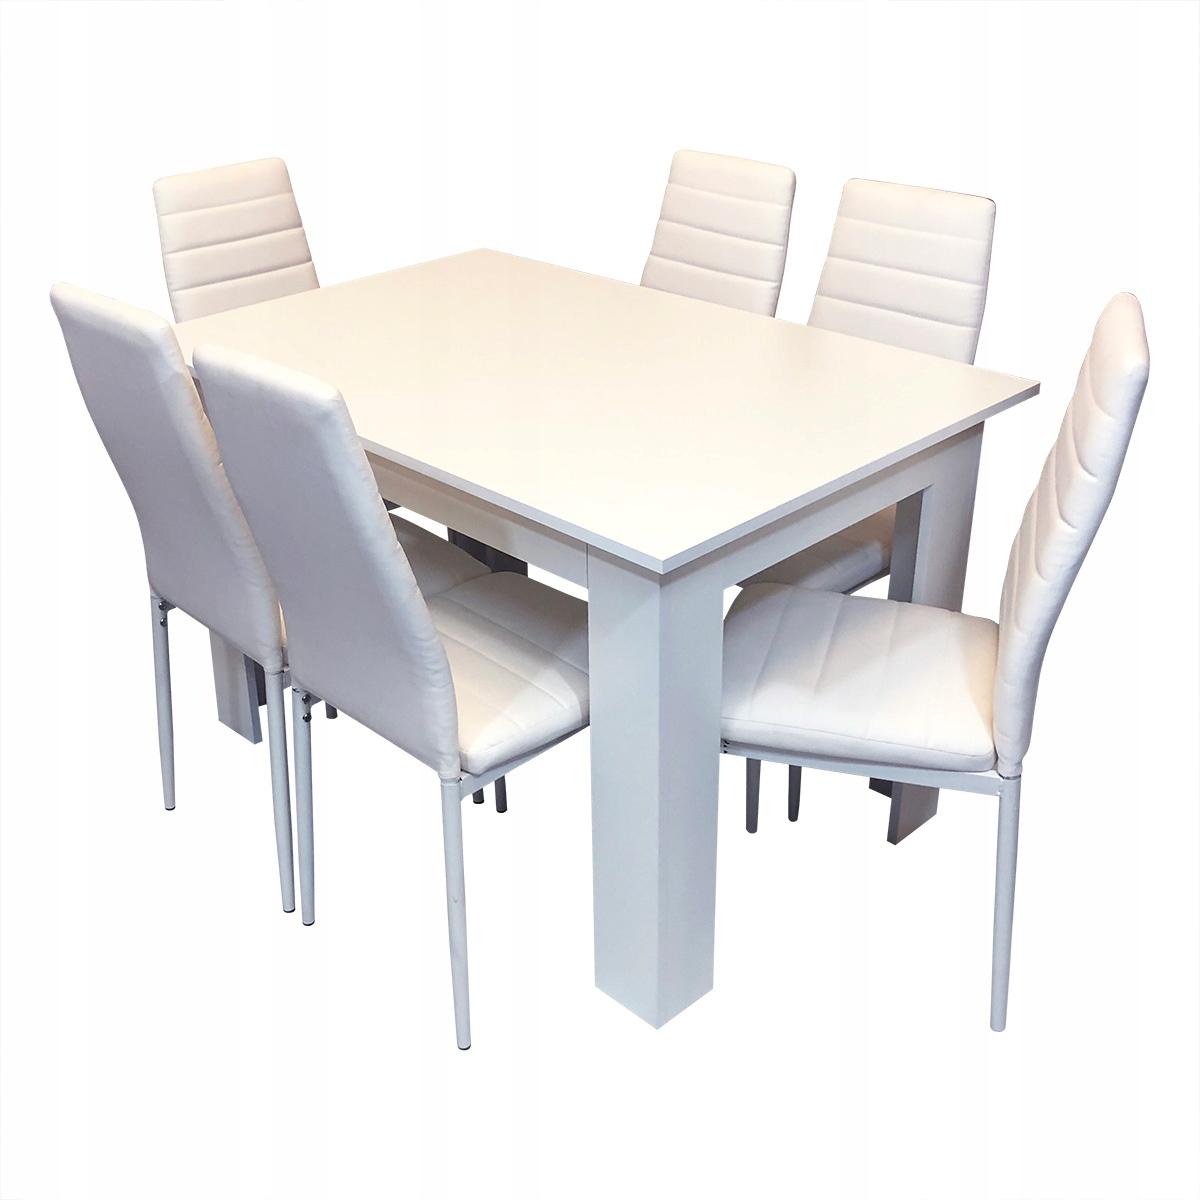 комплект стол 6 стульев Ницца, Милан белое Салон